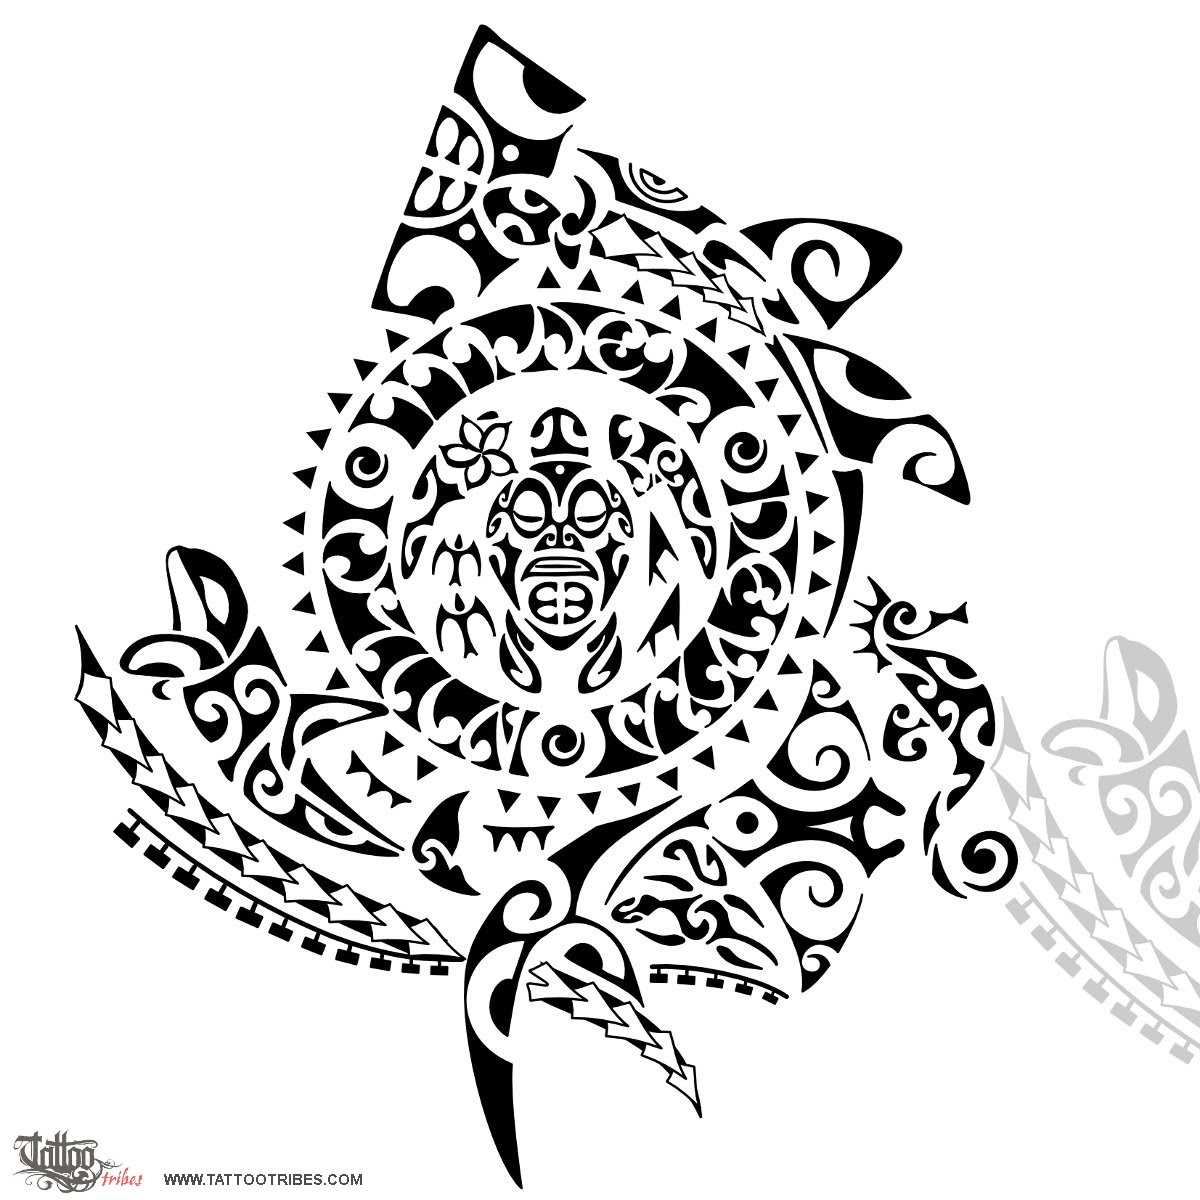 Significado Maories Free Tatuajes Y Simbolos Maories Para Mujeres